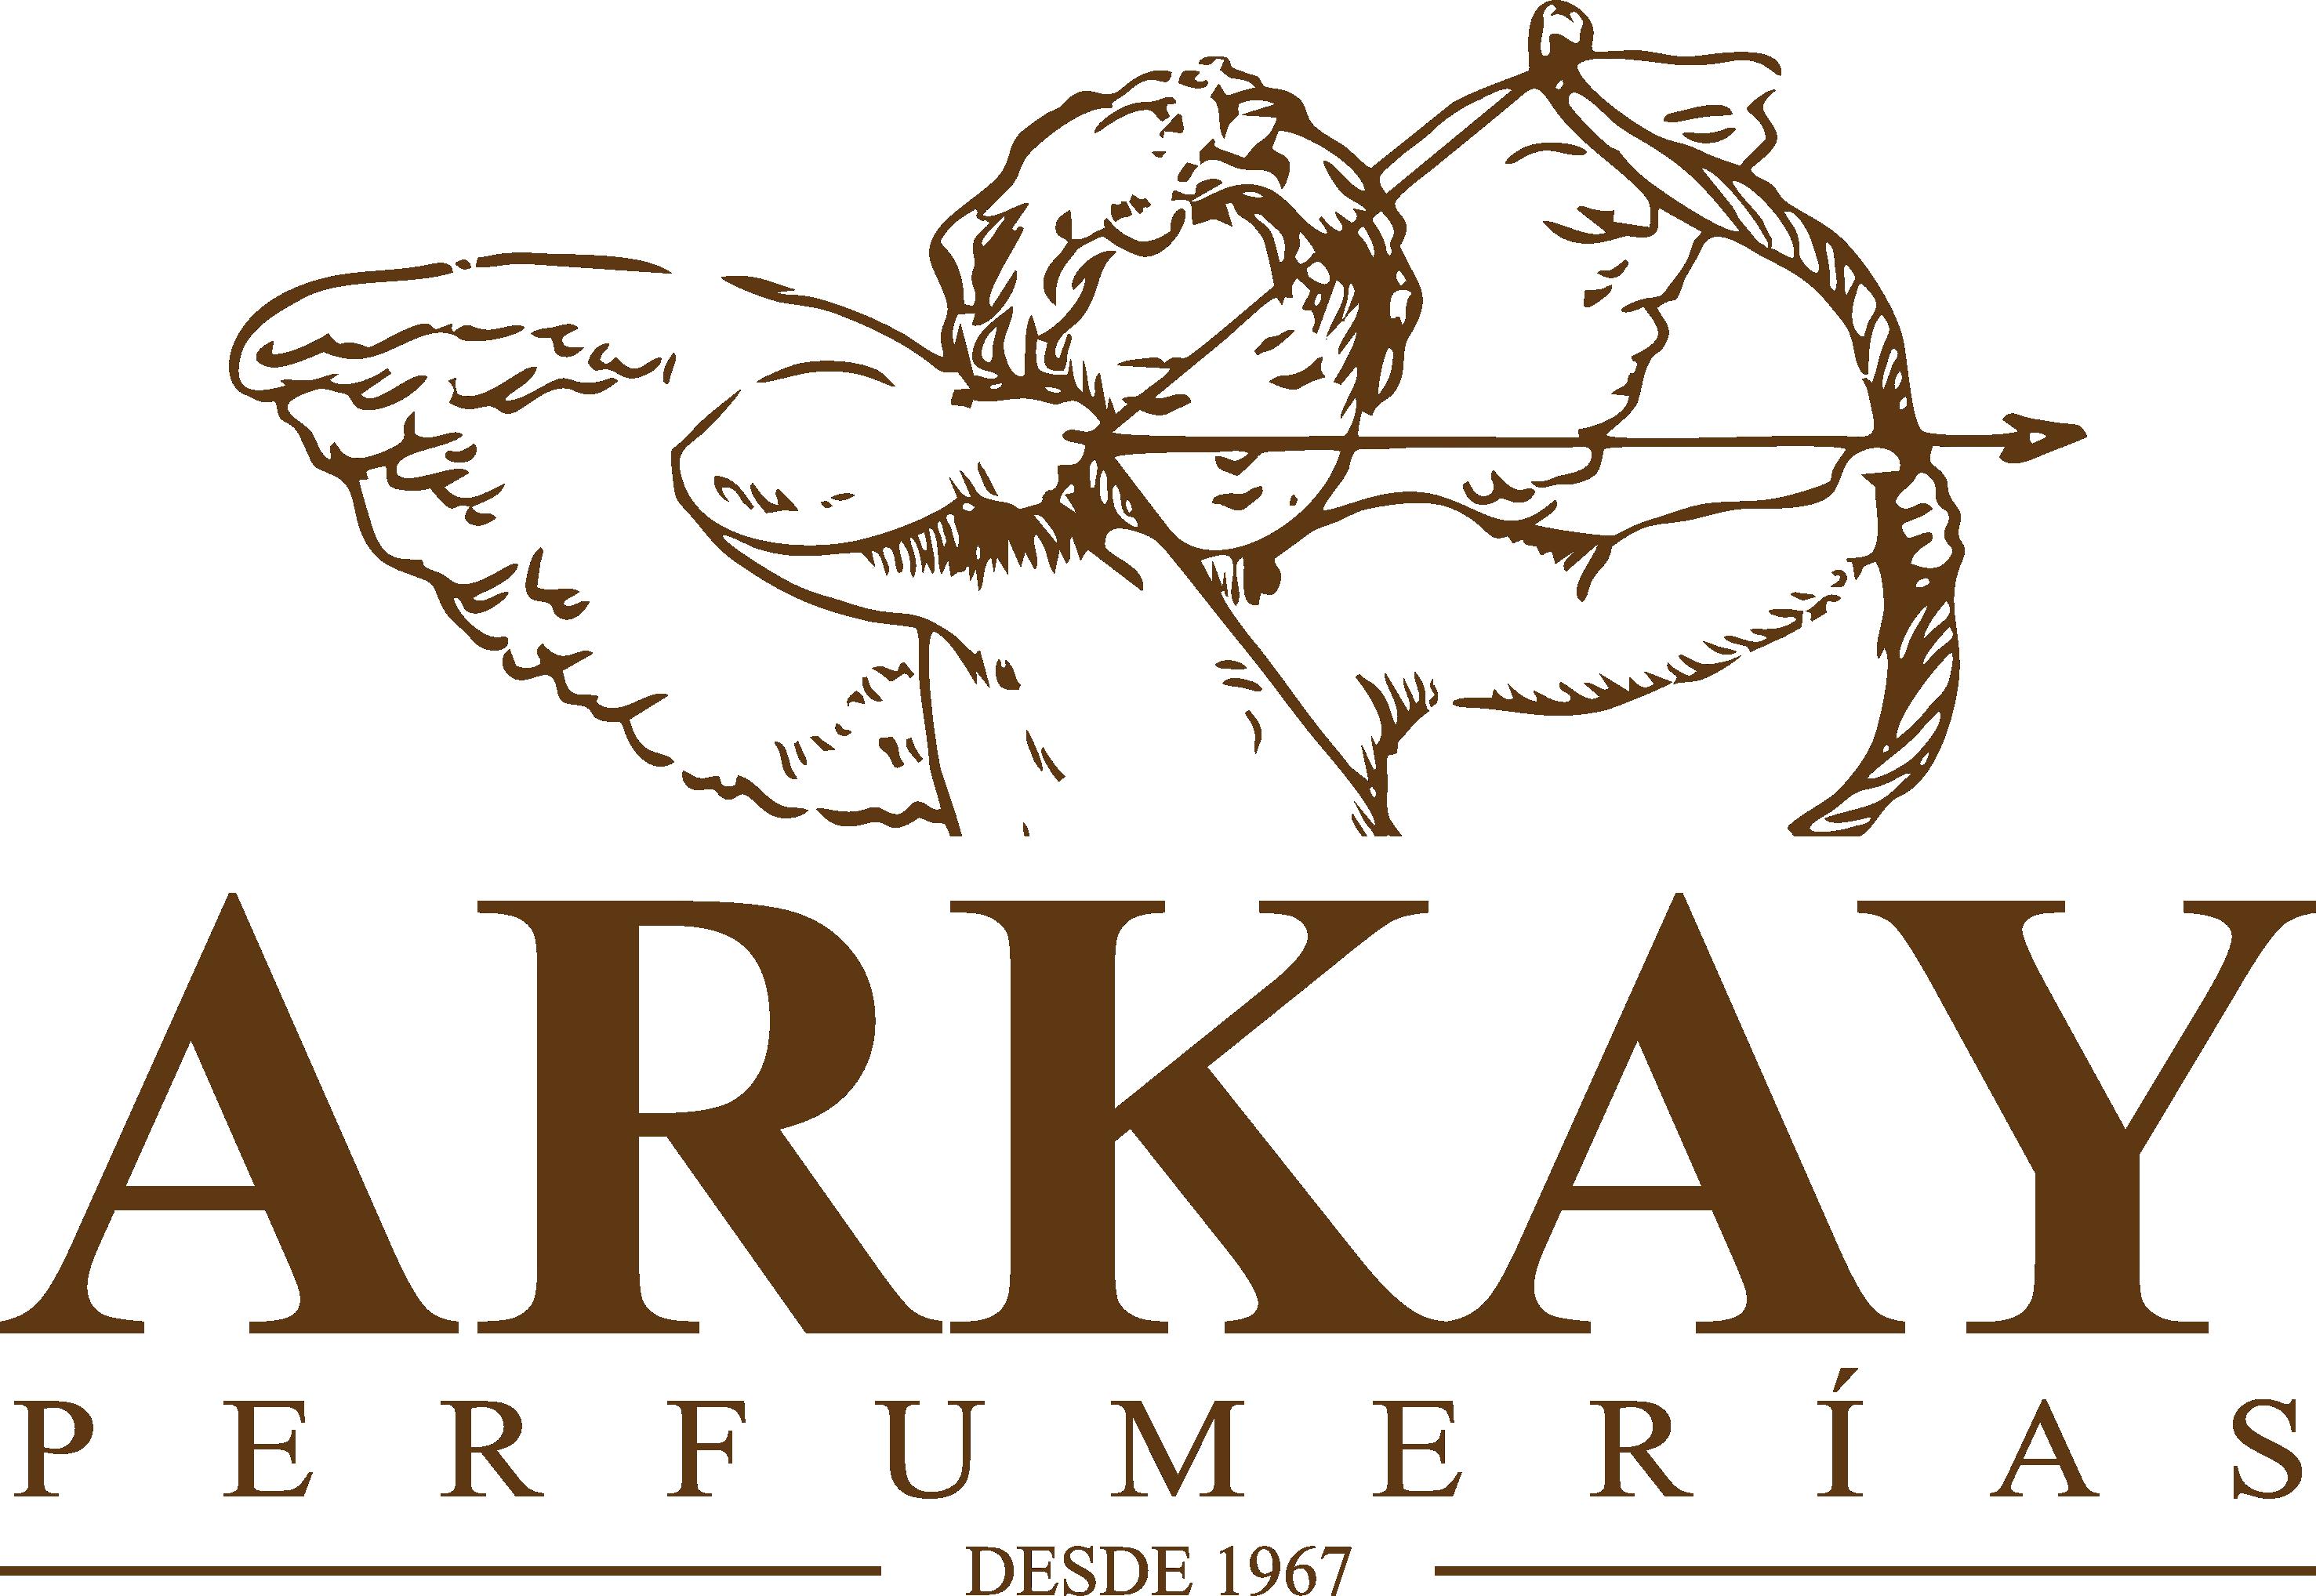 Perfumerias Arkay